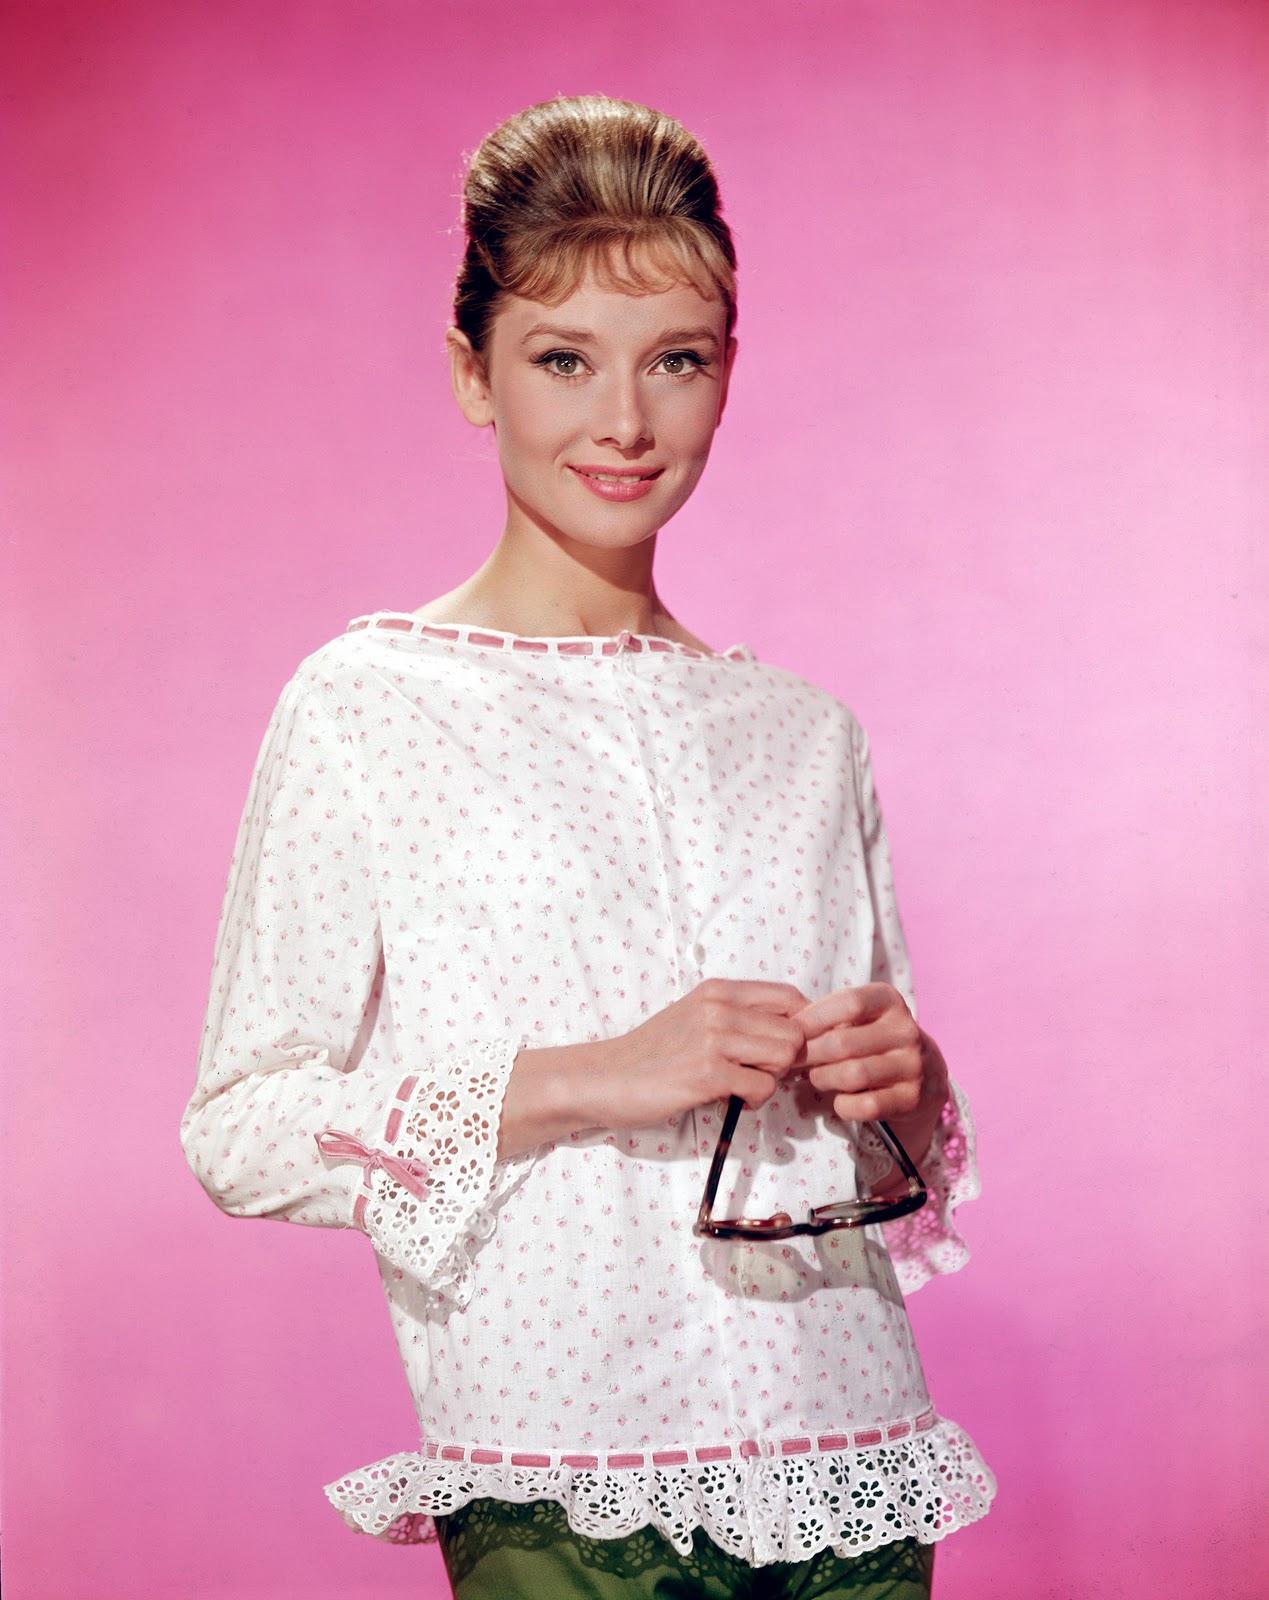 http://2.bp.blogspot.com/_4u_Gqif3e4c/TPRcg2r-kEI/AAAAAAAAAJk/cA0ouLbdaKA/s1600/Audrey-Hepburn-classic-movies-9448671-1745-2200.jpg